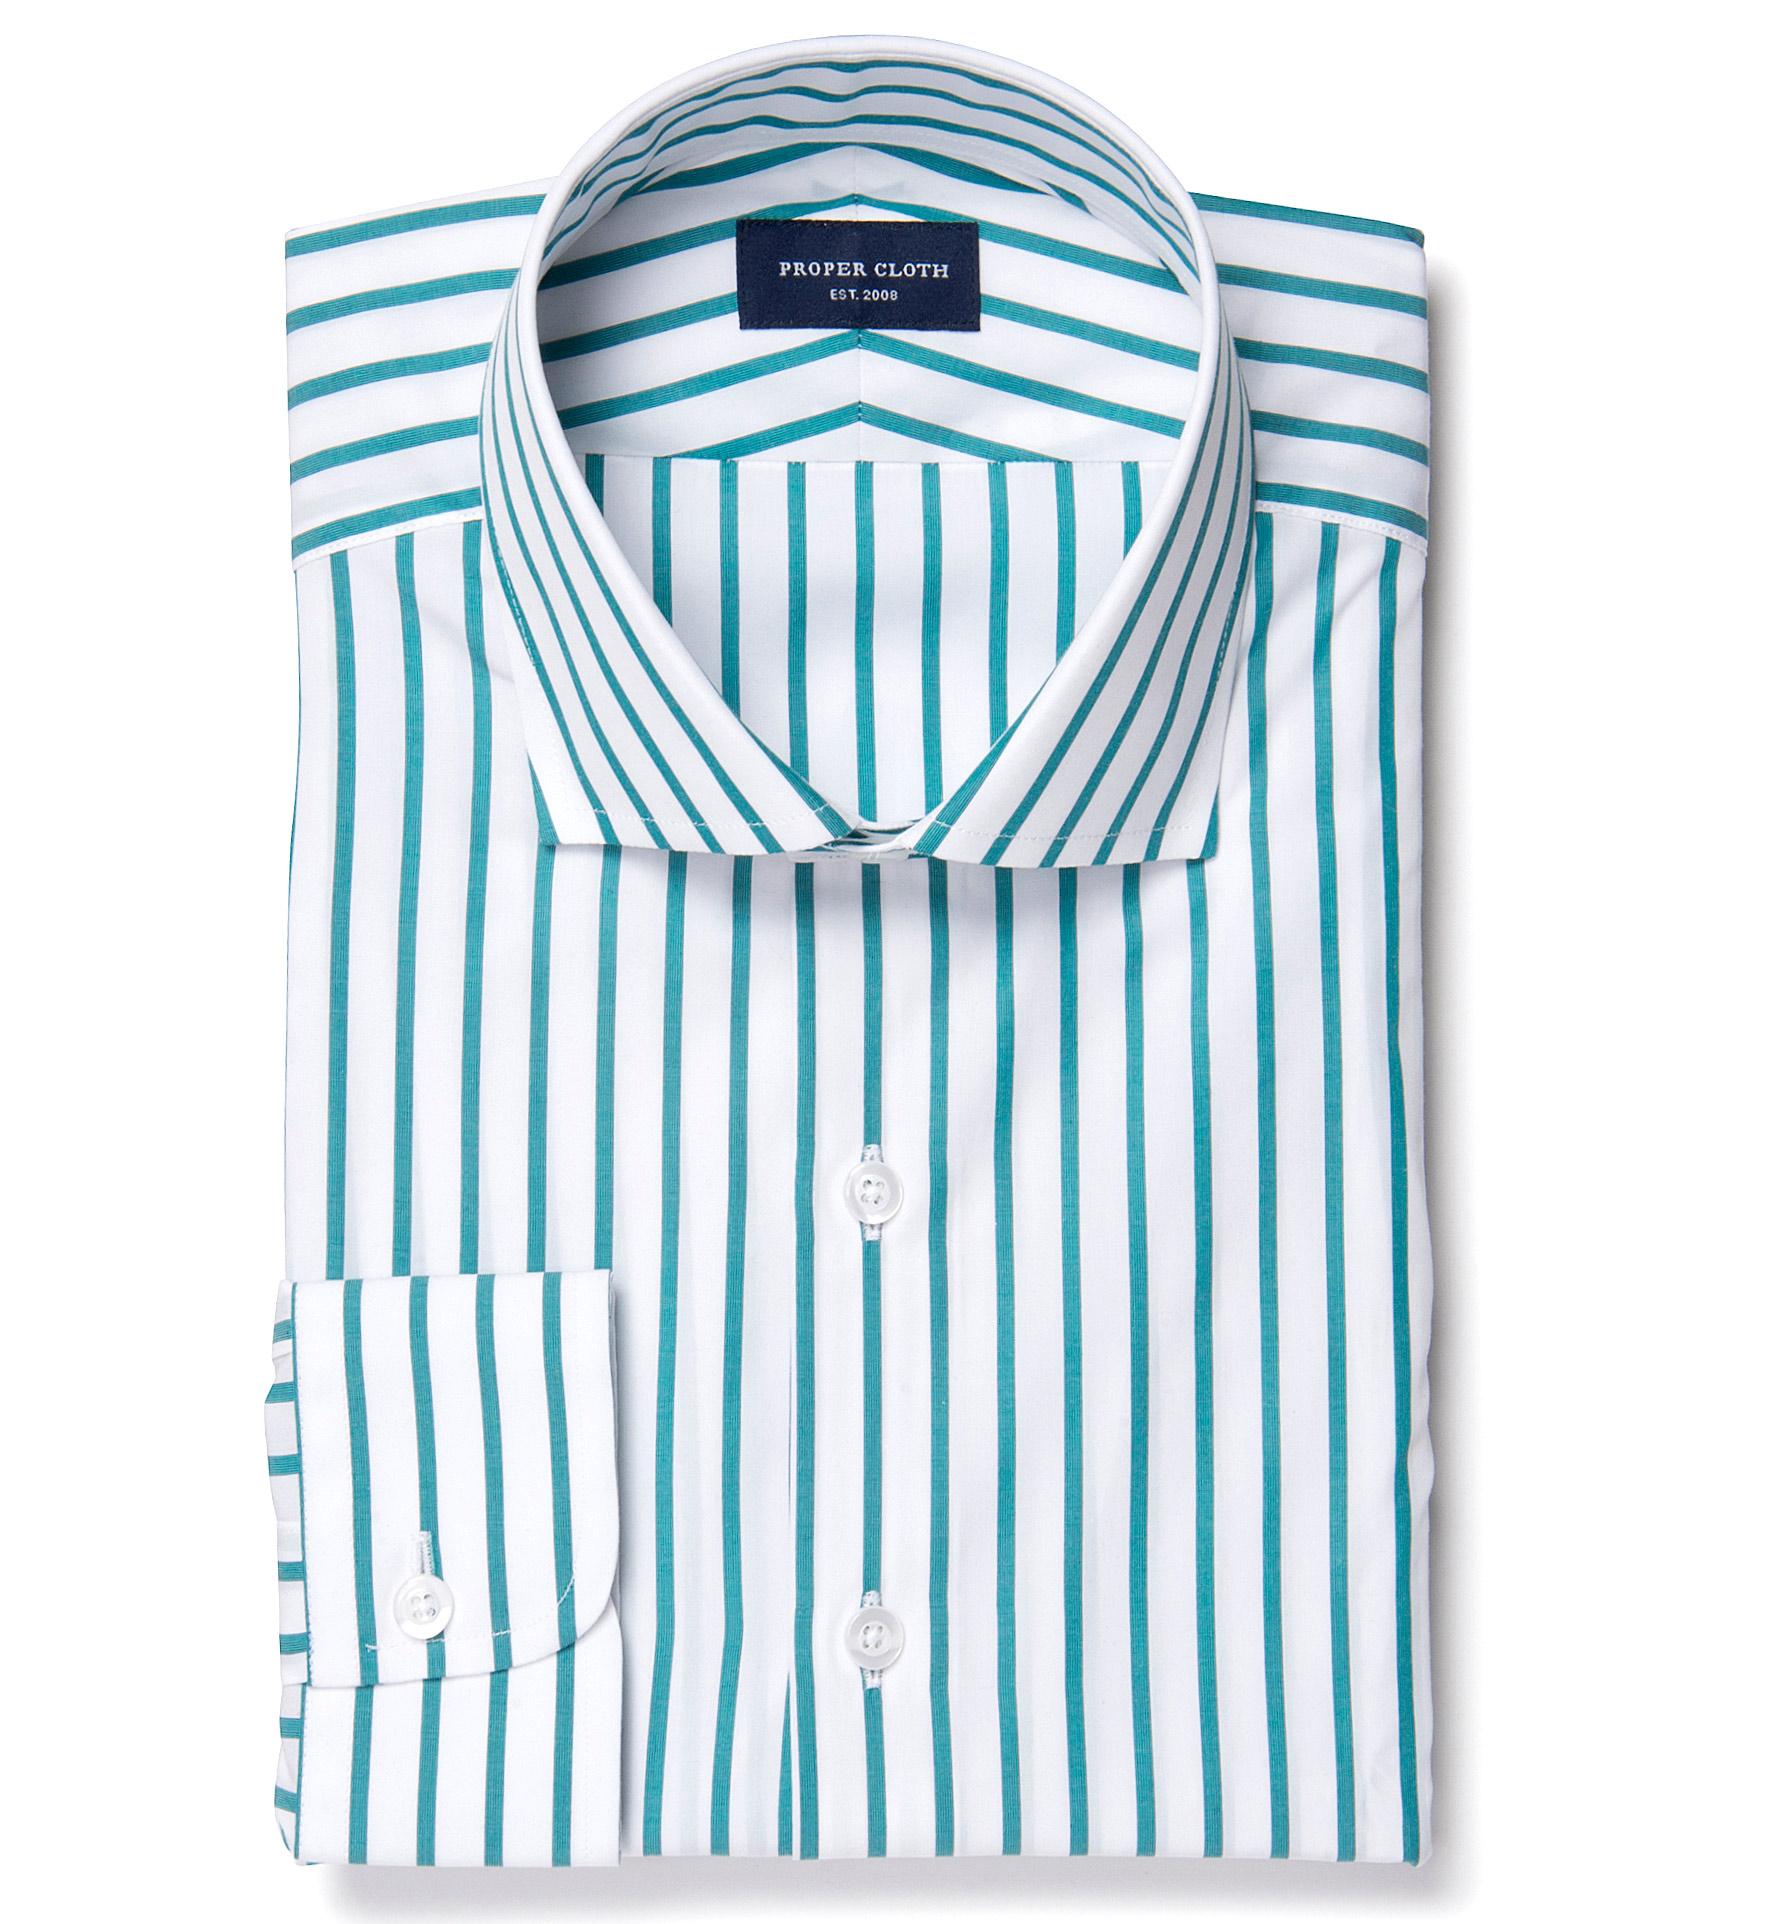 Canclini Teal Wide Stripe Dress Shirt By Proper Cloth